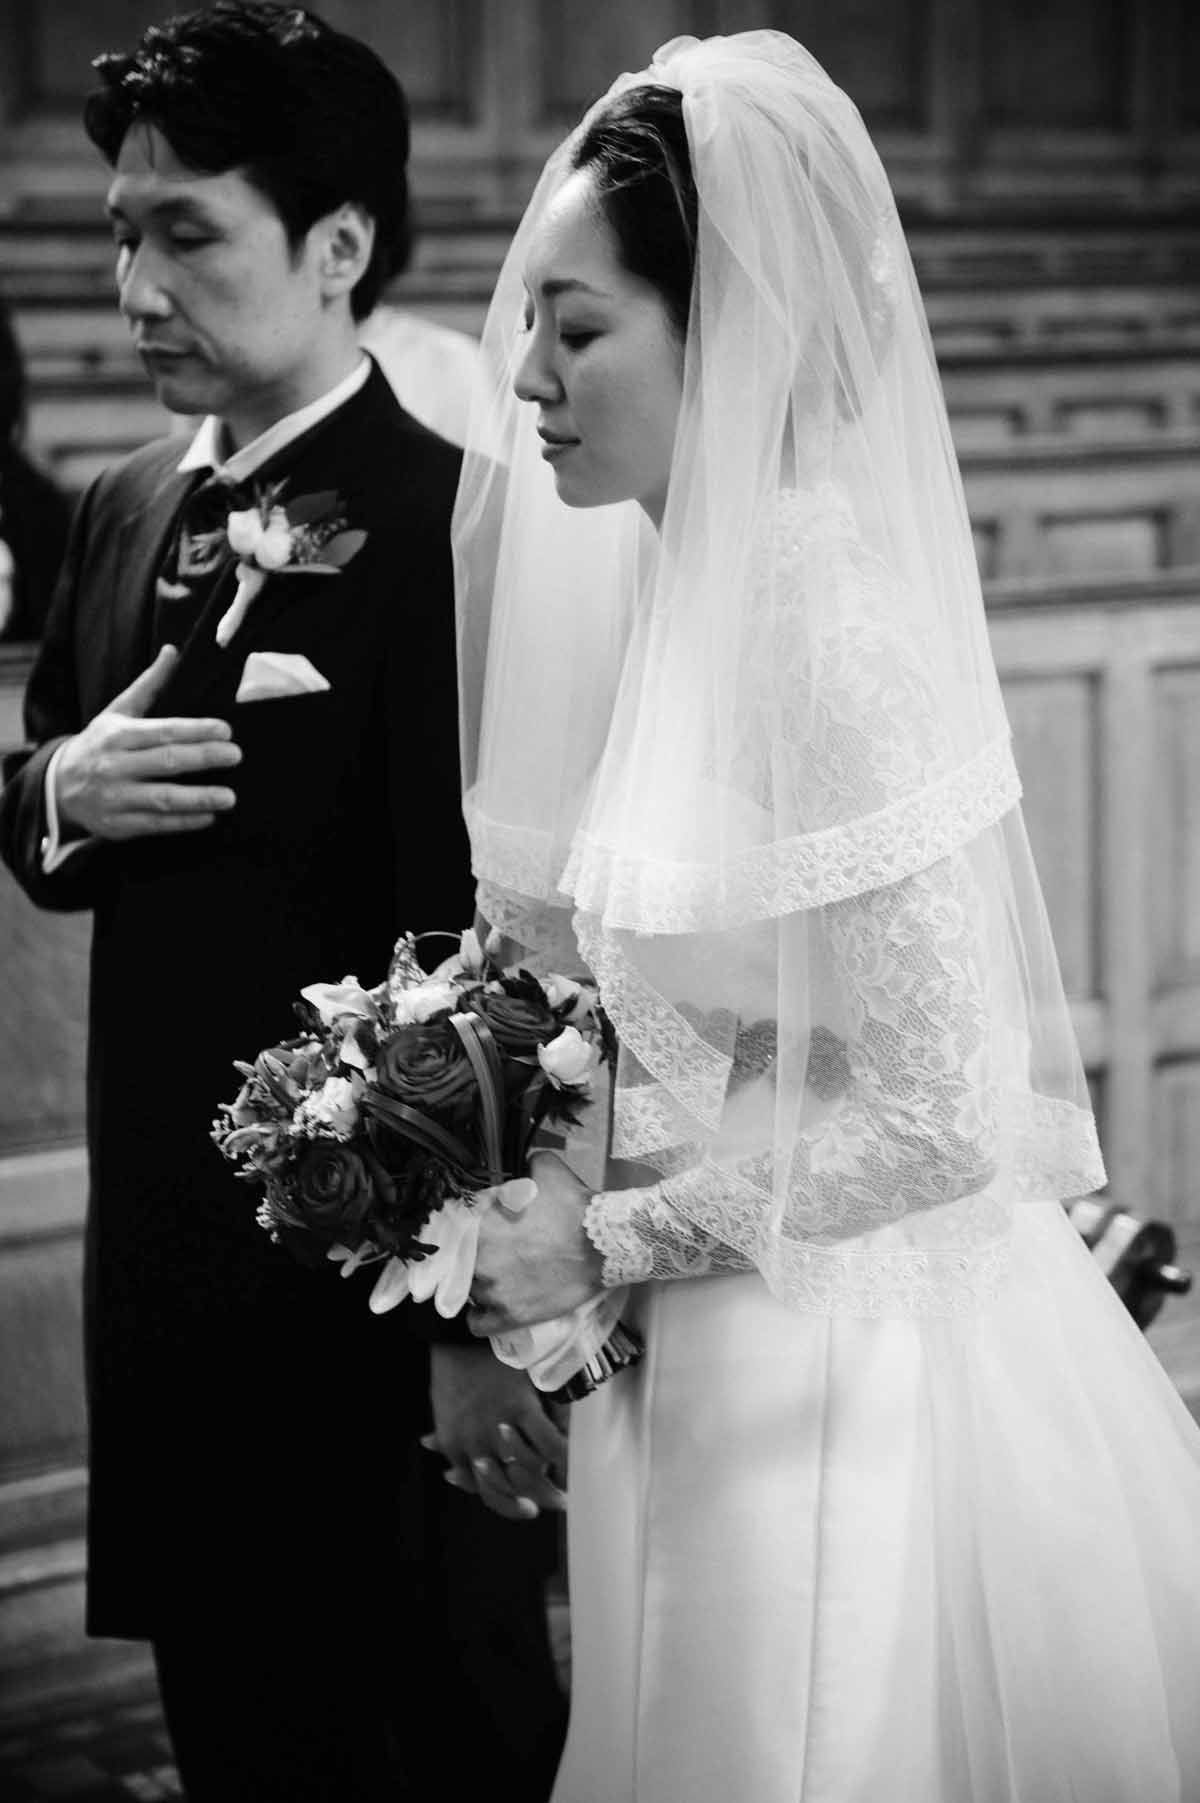 Wedding Ceremony at Trinity College Chapel